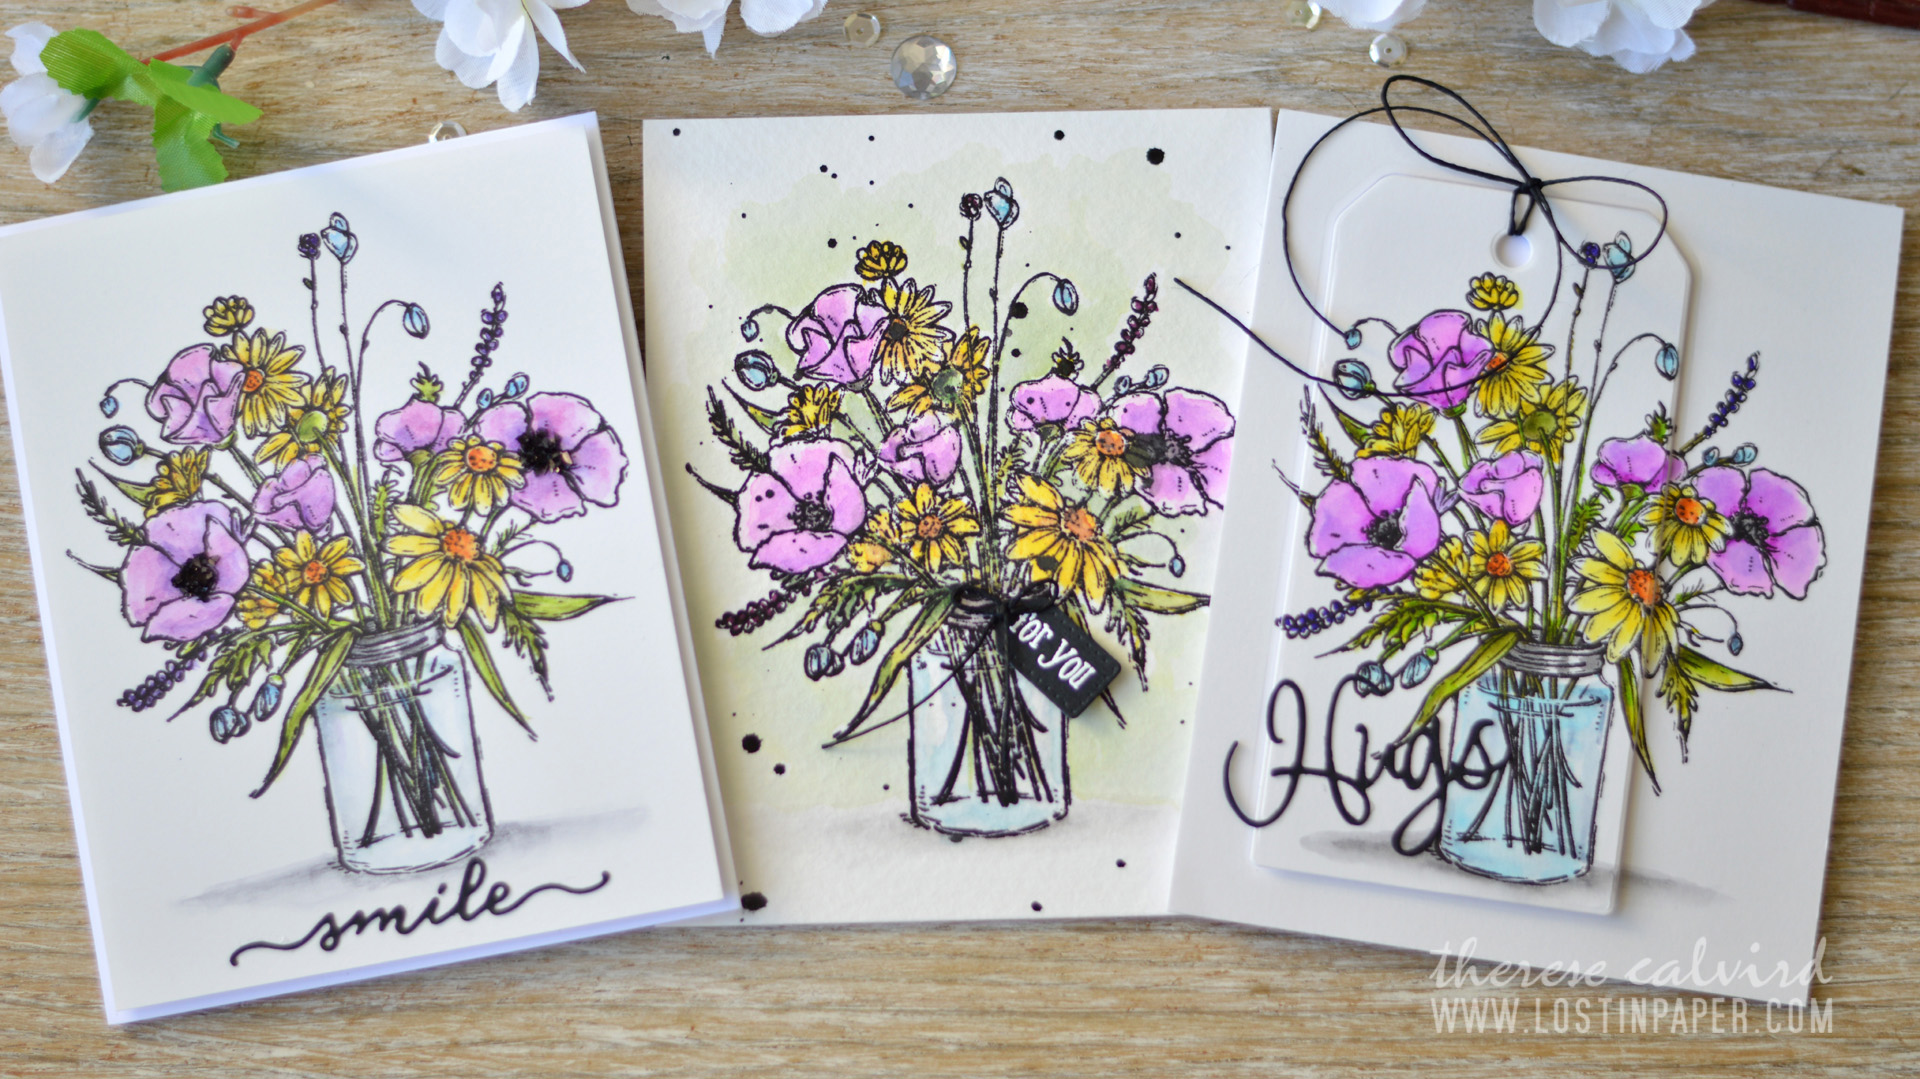 Kara Lynnes Card Designs Crafty Friends Are The Best